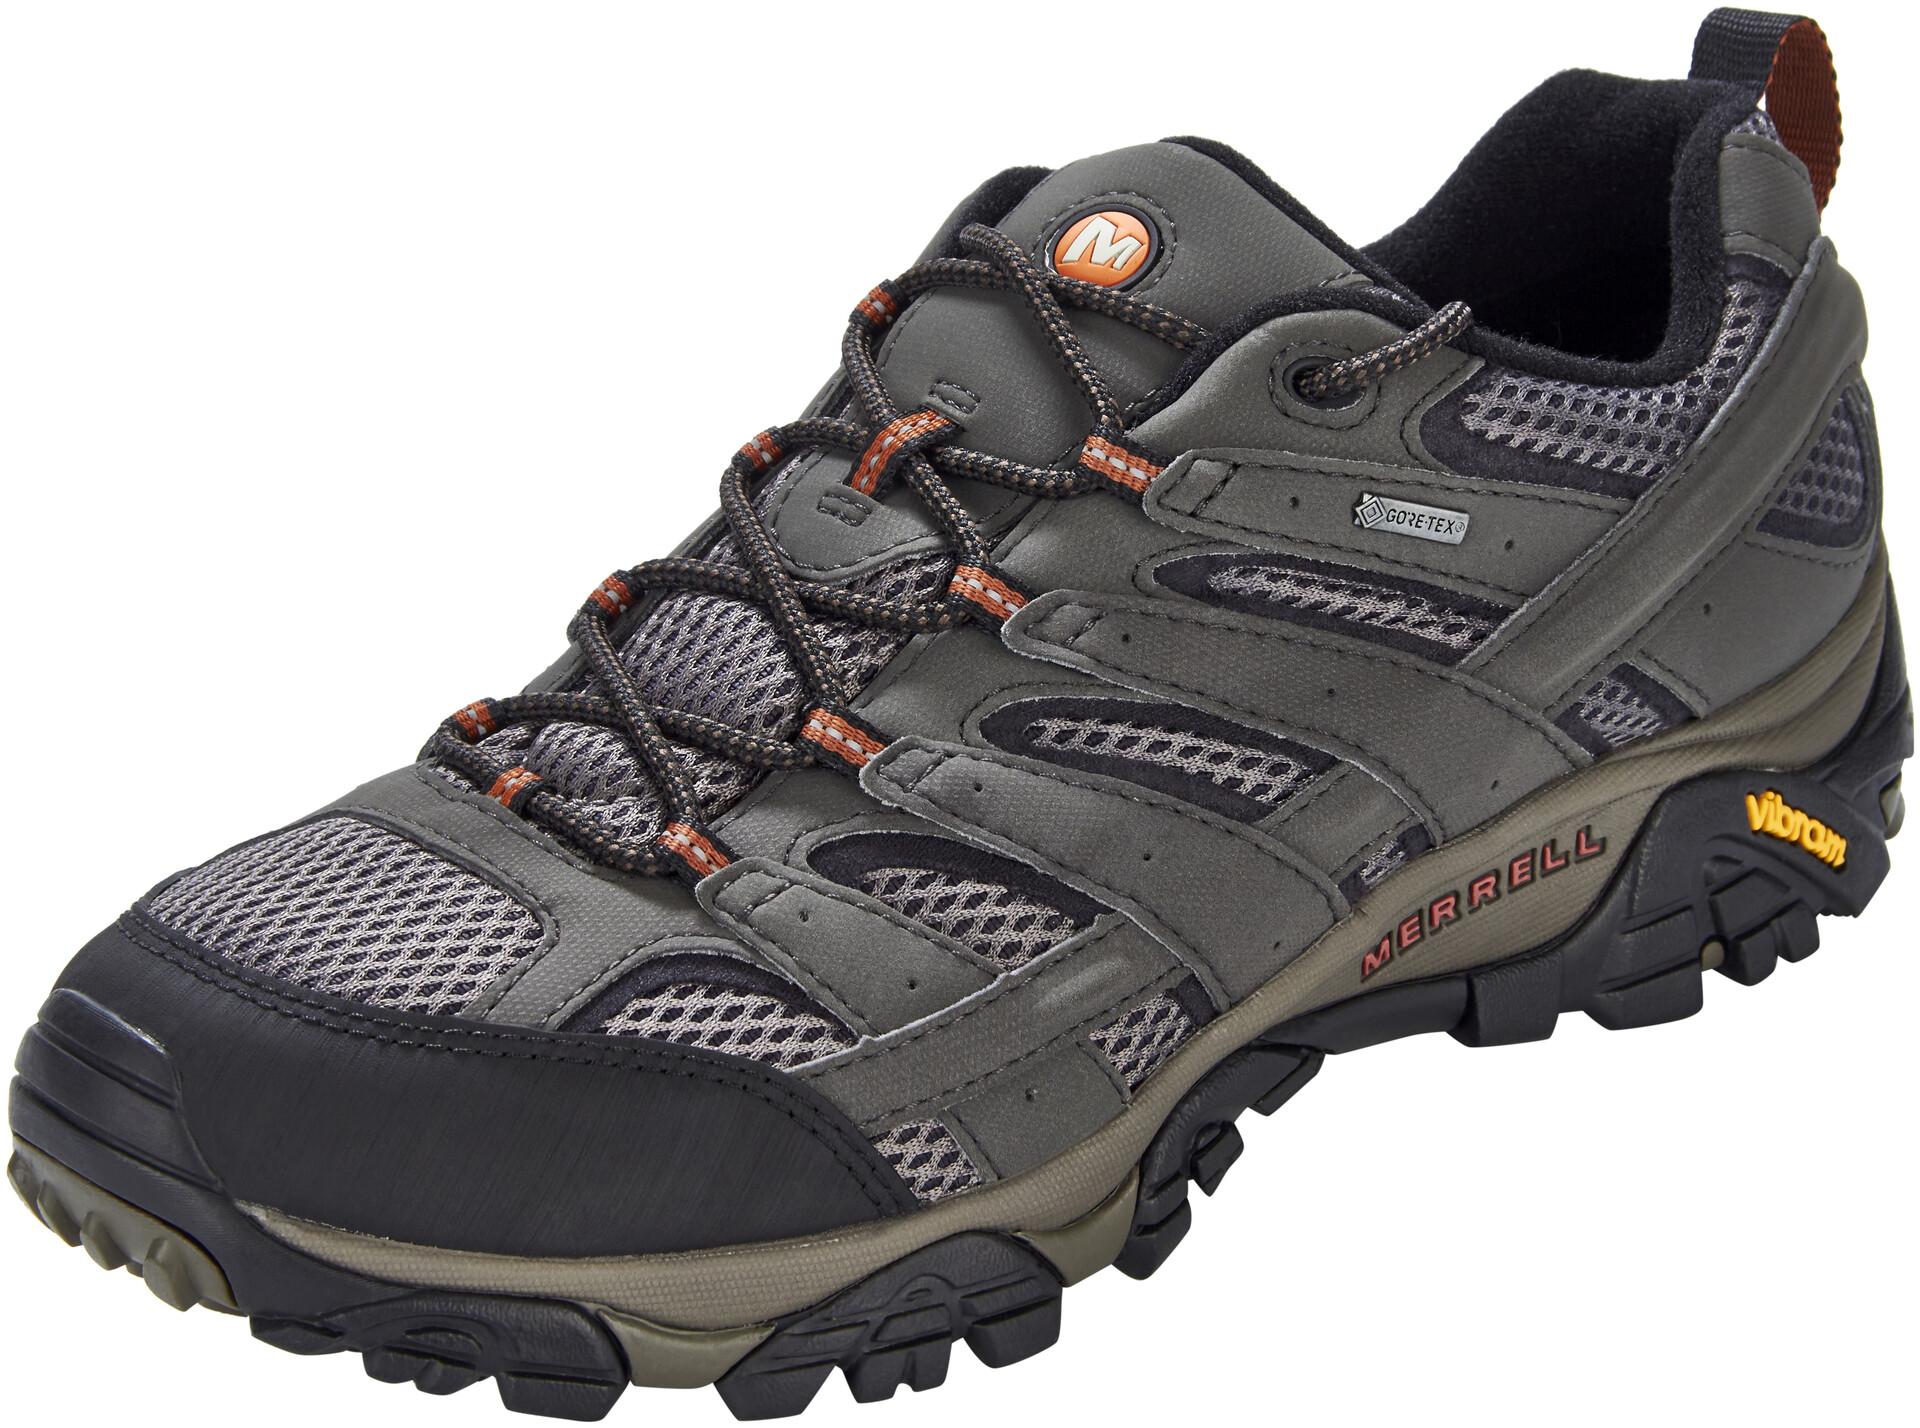 Merrell Moab 2 GTX Shoes Men beluga at